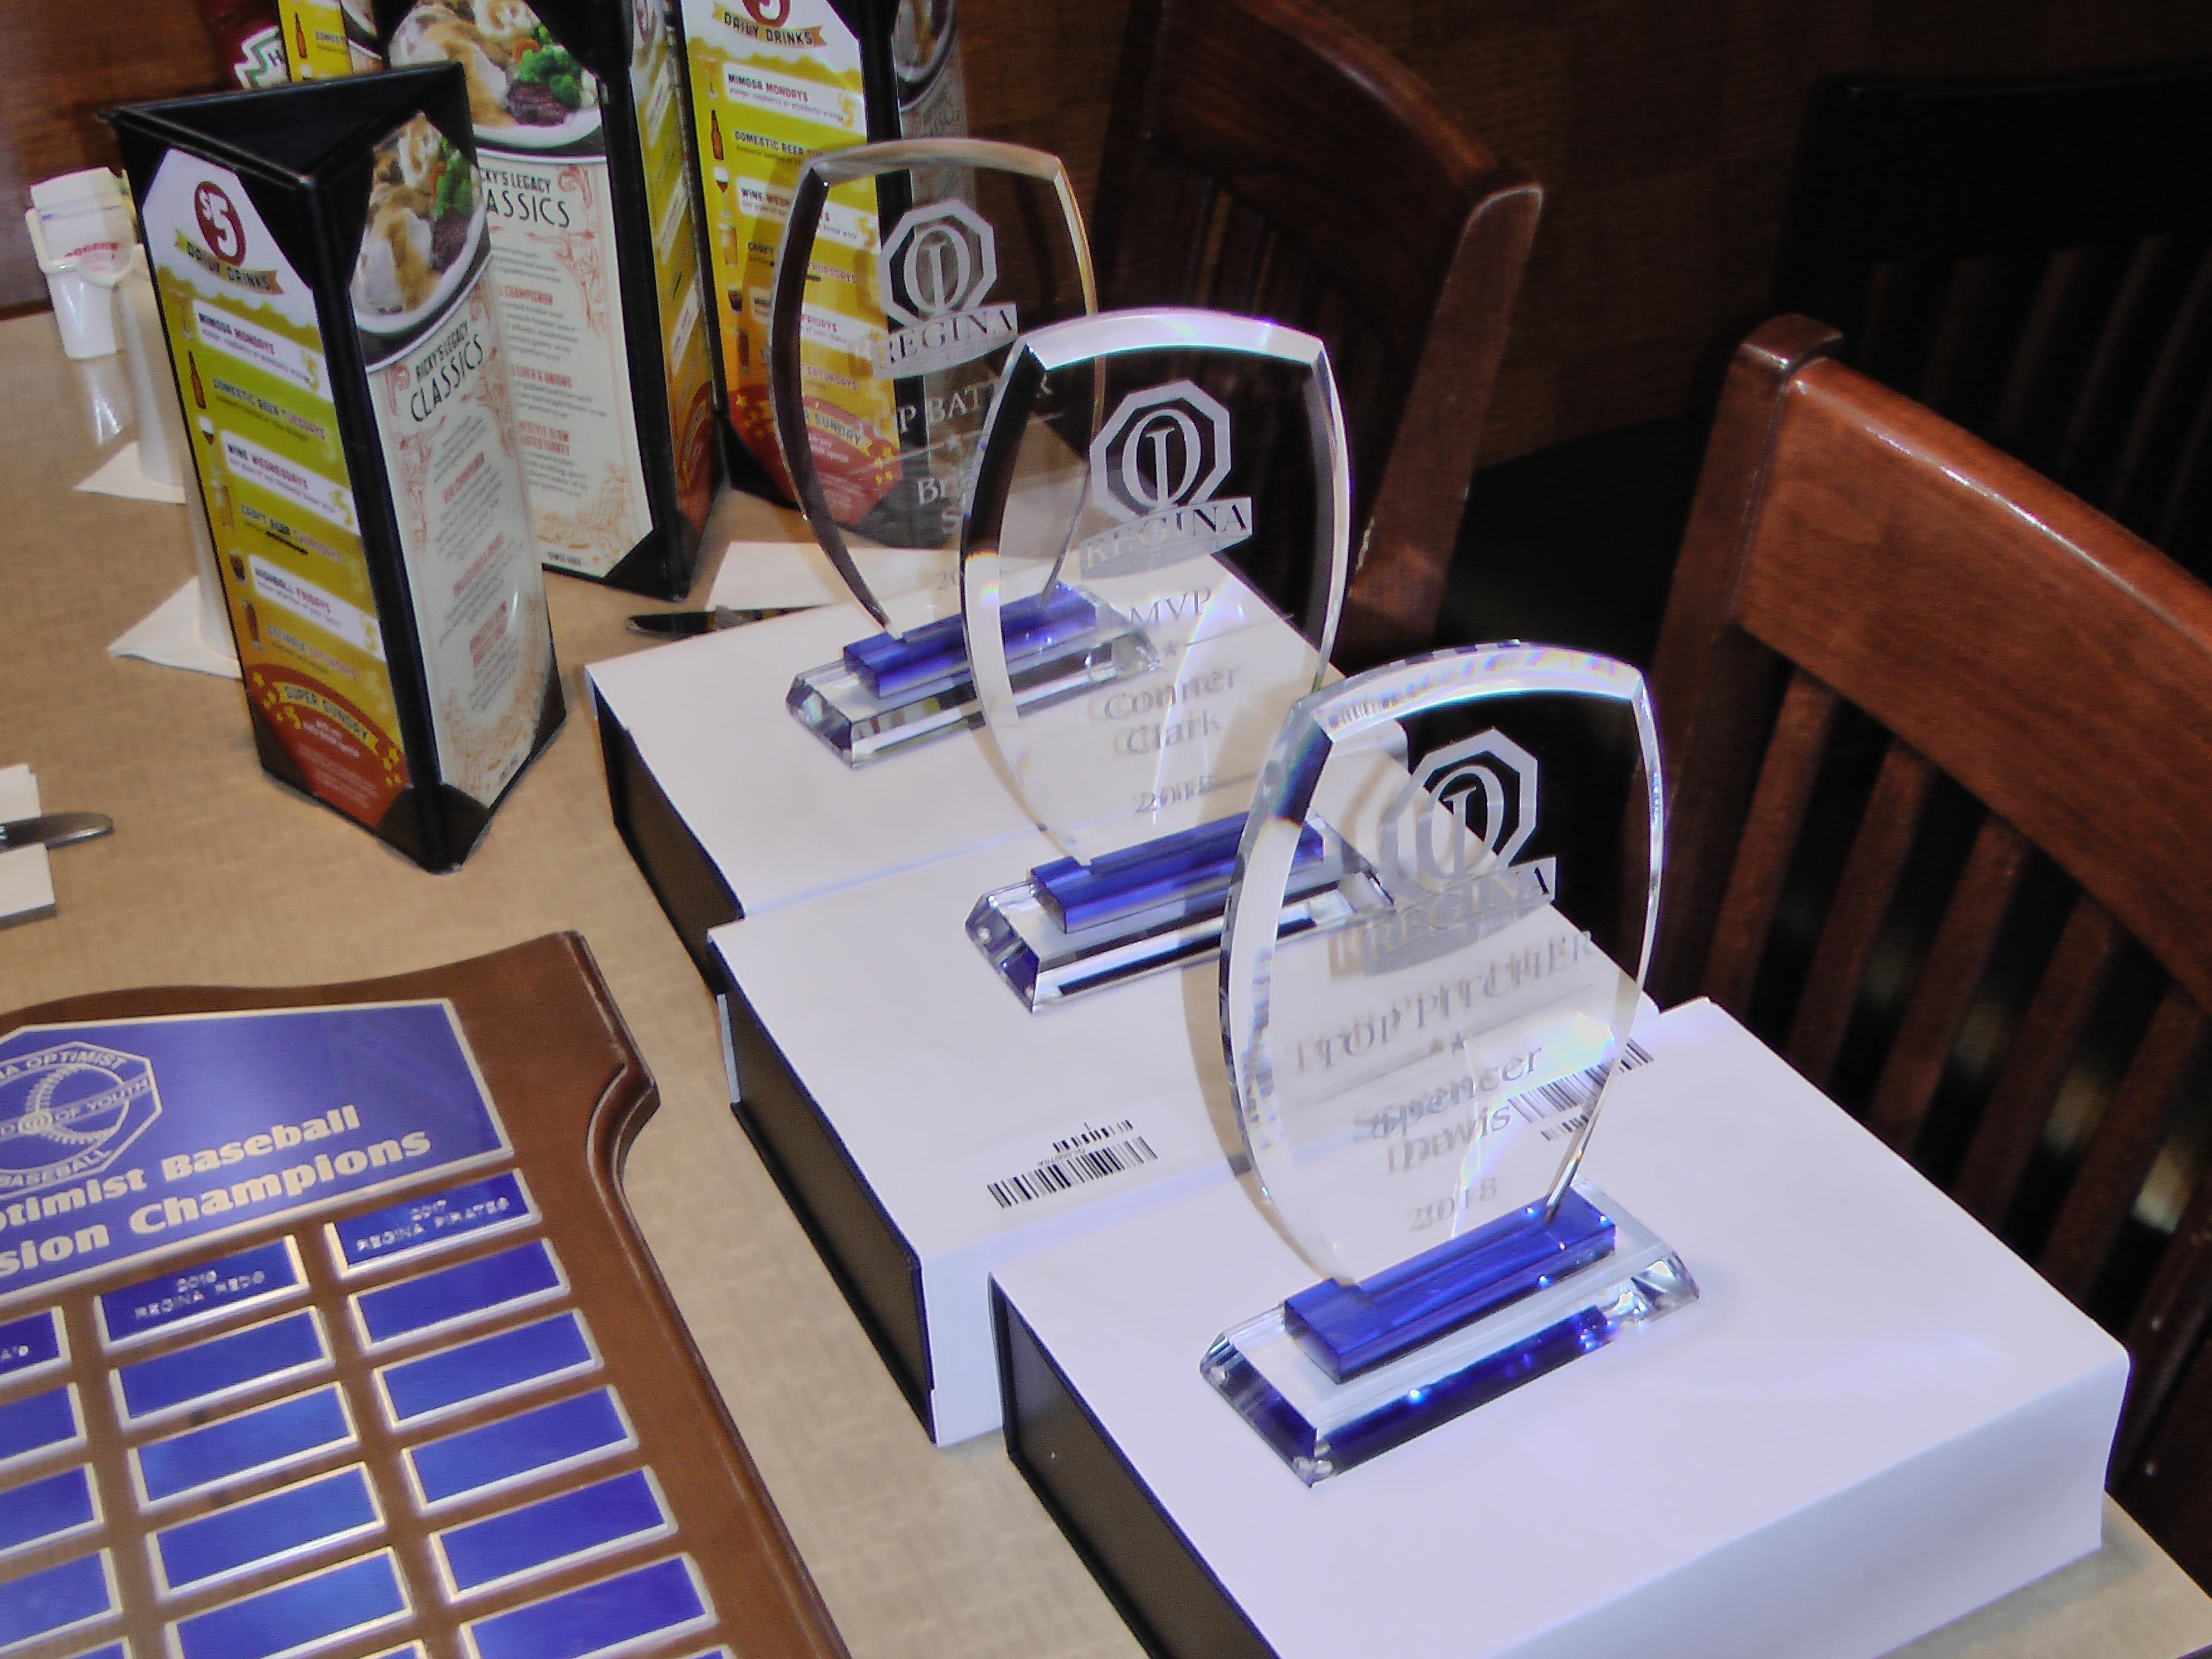 Awards Night Regina Optimist Baseball Association on Nov 26/18, held at Ricky's on Albert Street, at monthly Regina Optimist Club Meeting. - Image 7